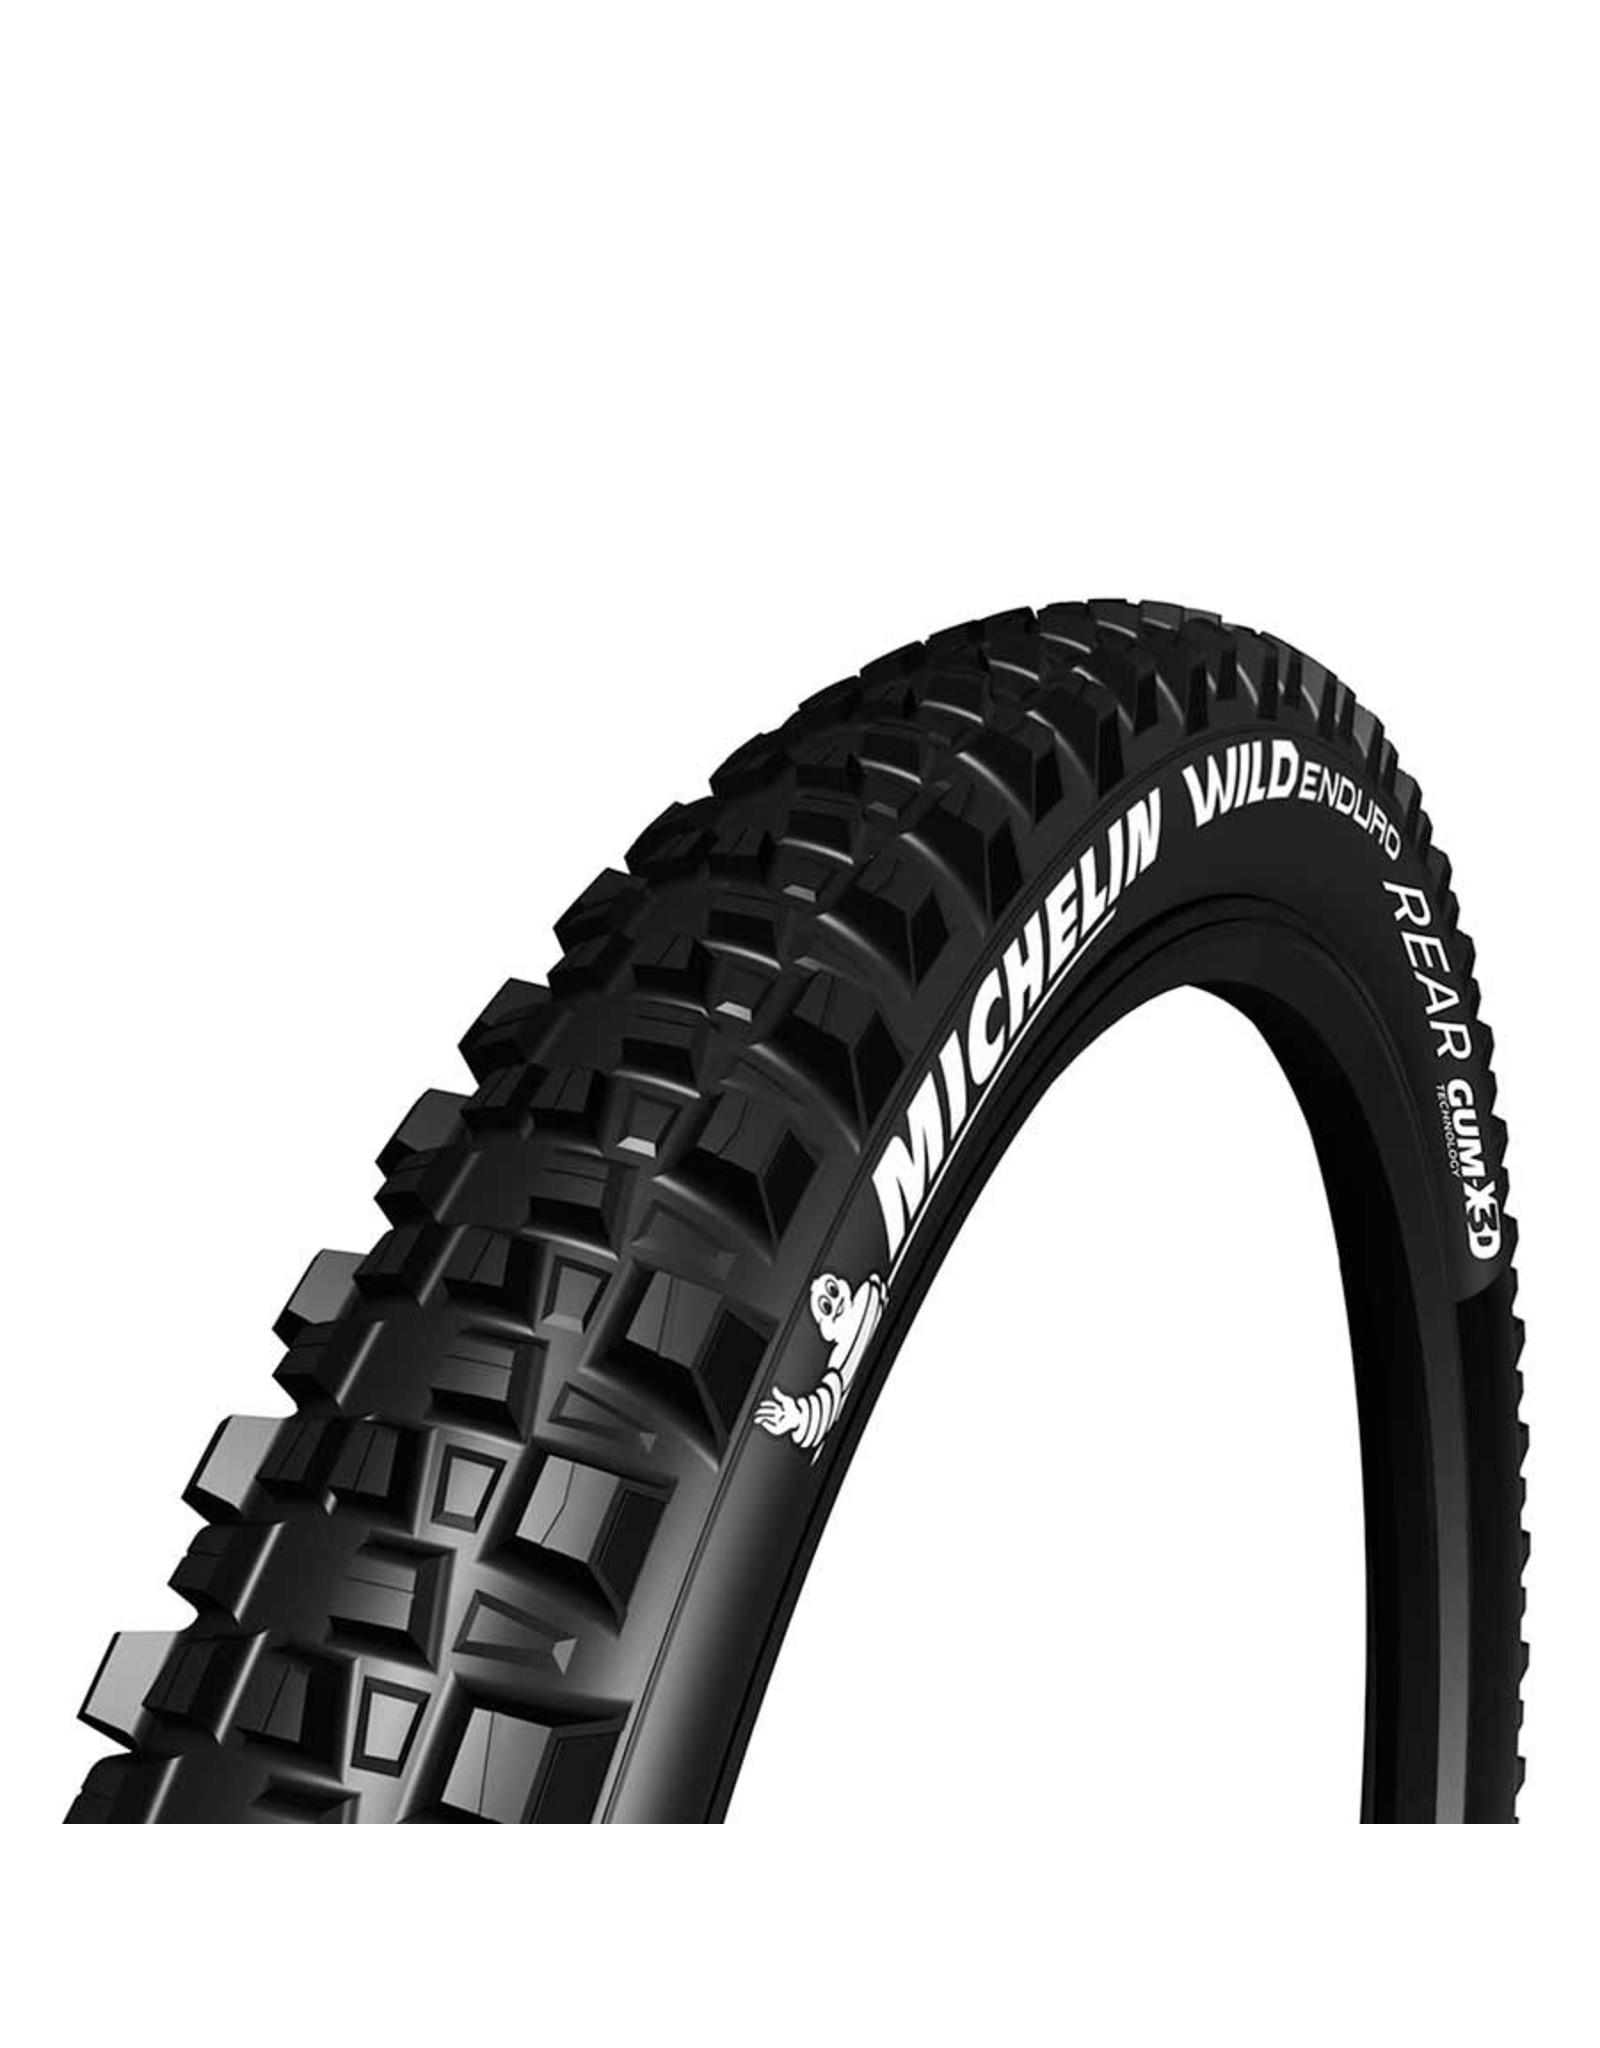 Michelin, Wild Enduro Front, Tire, 29''x2.40, Folding, Tubeless Ready, MAGI-X, GravityShield, 60TPI, Black